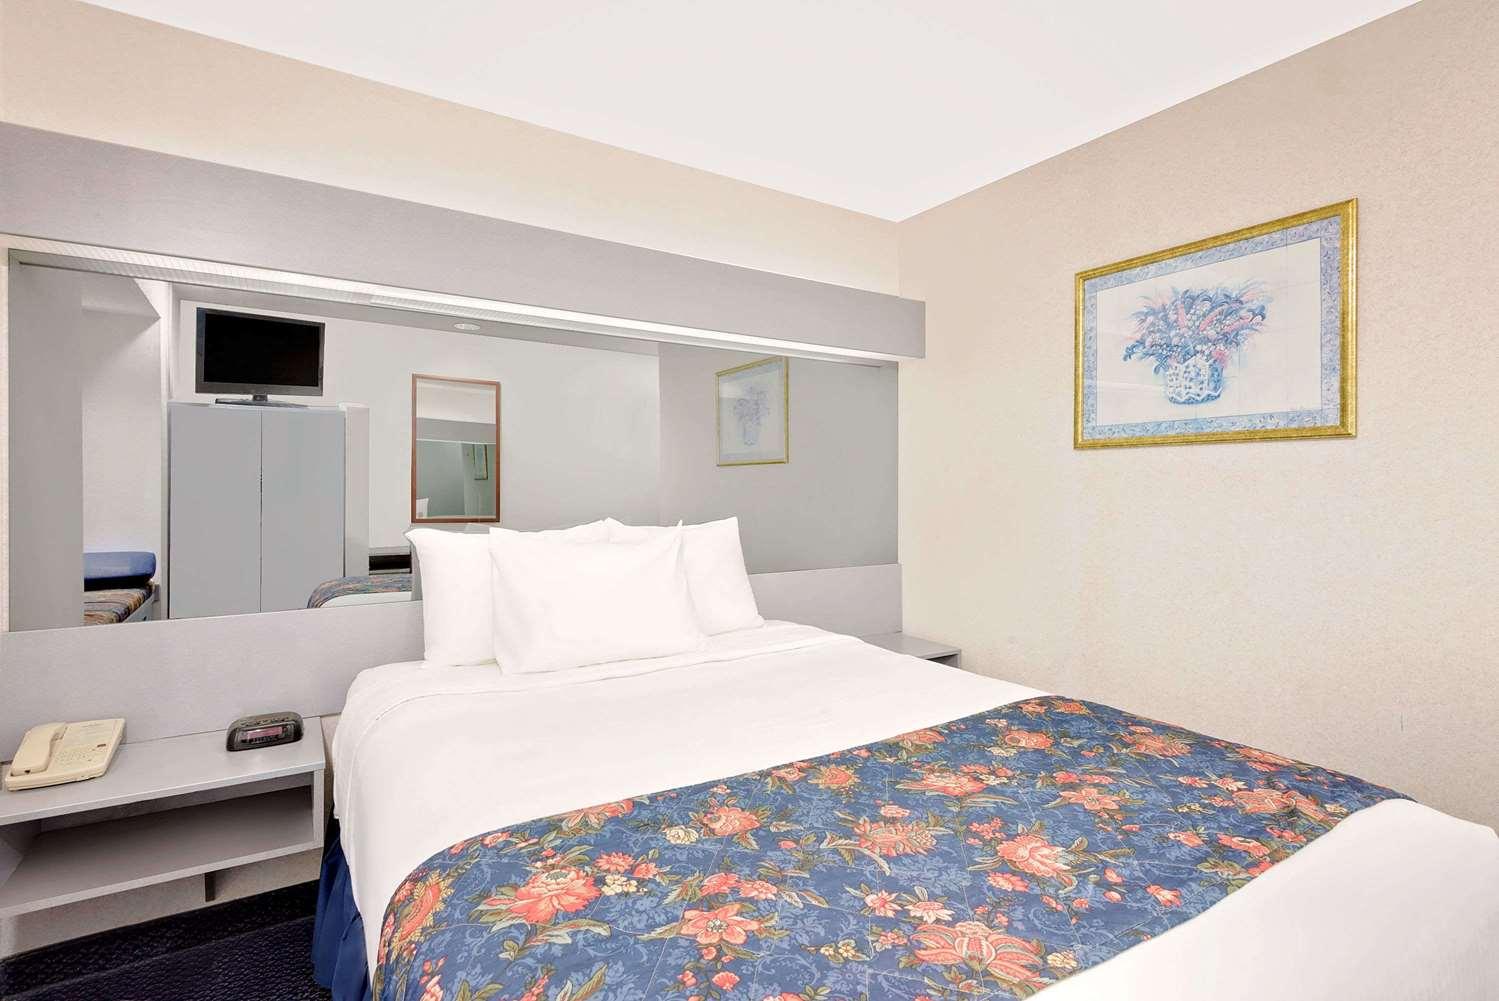 Room - Microtel Inn & Suites by Wyndham Hagerstown